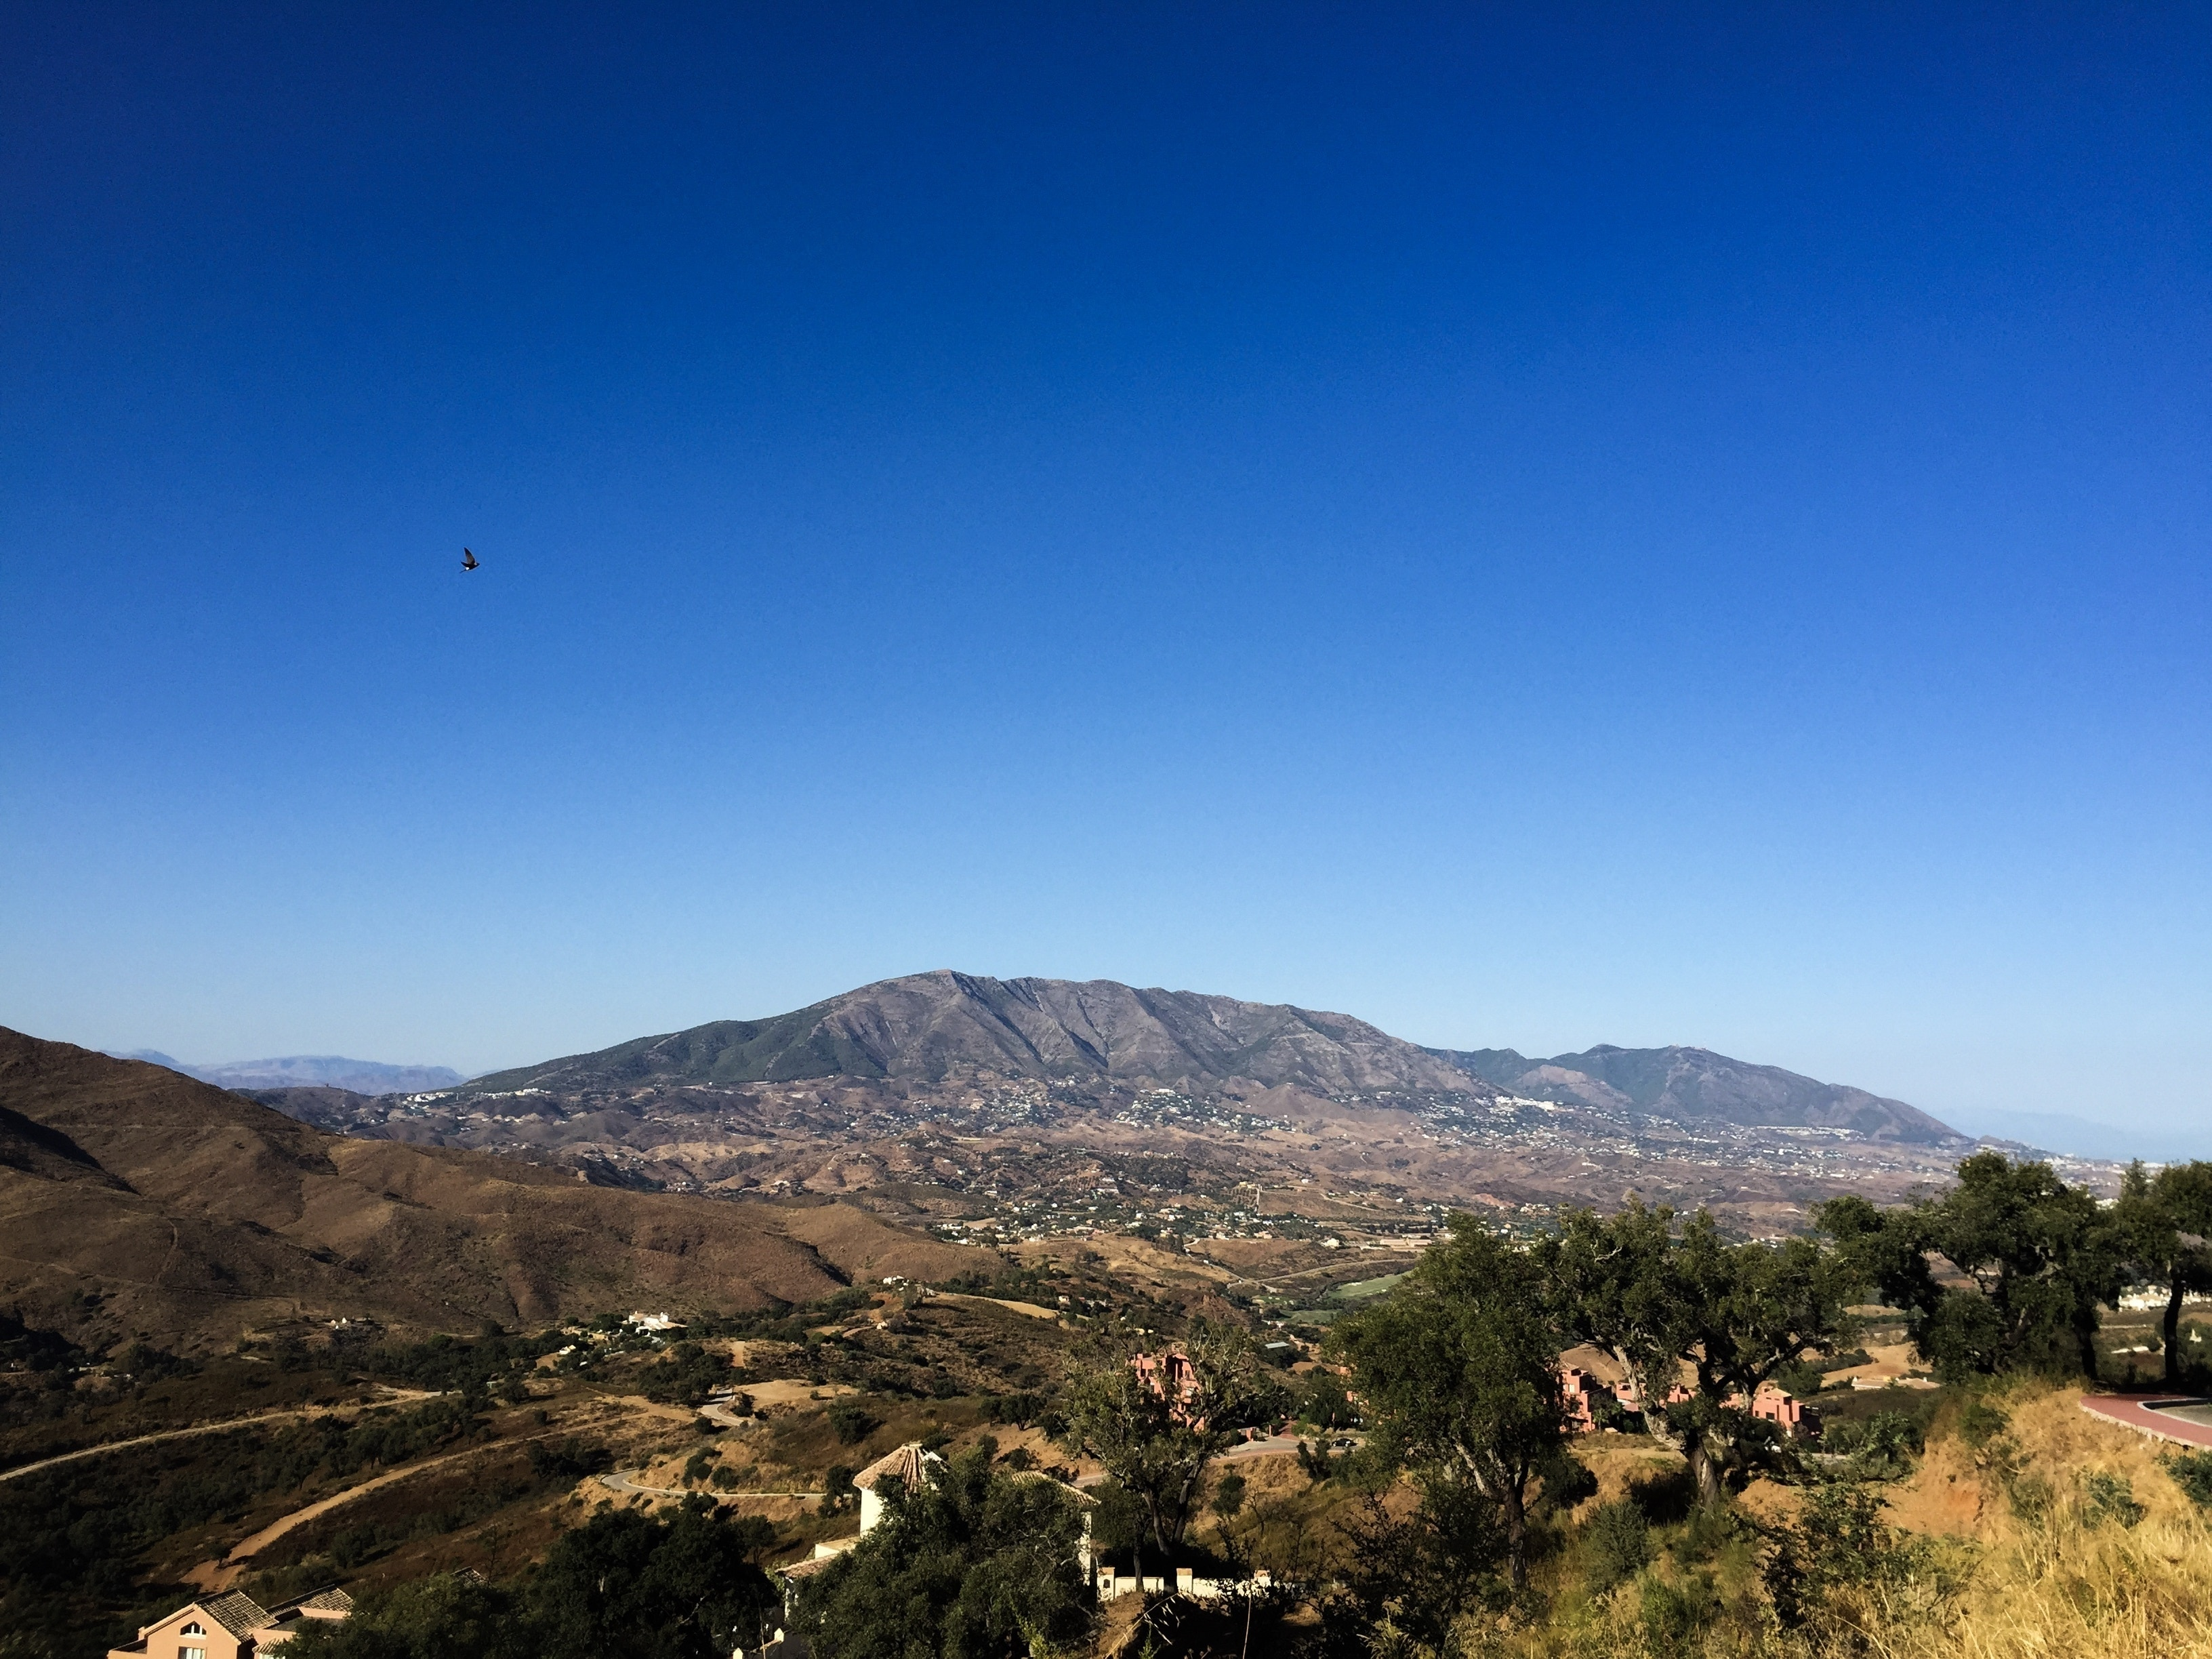 Elviria, Marbella, Andalusia, Spain